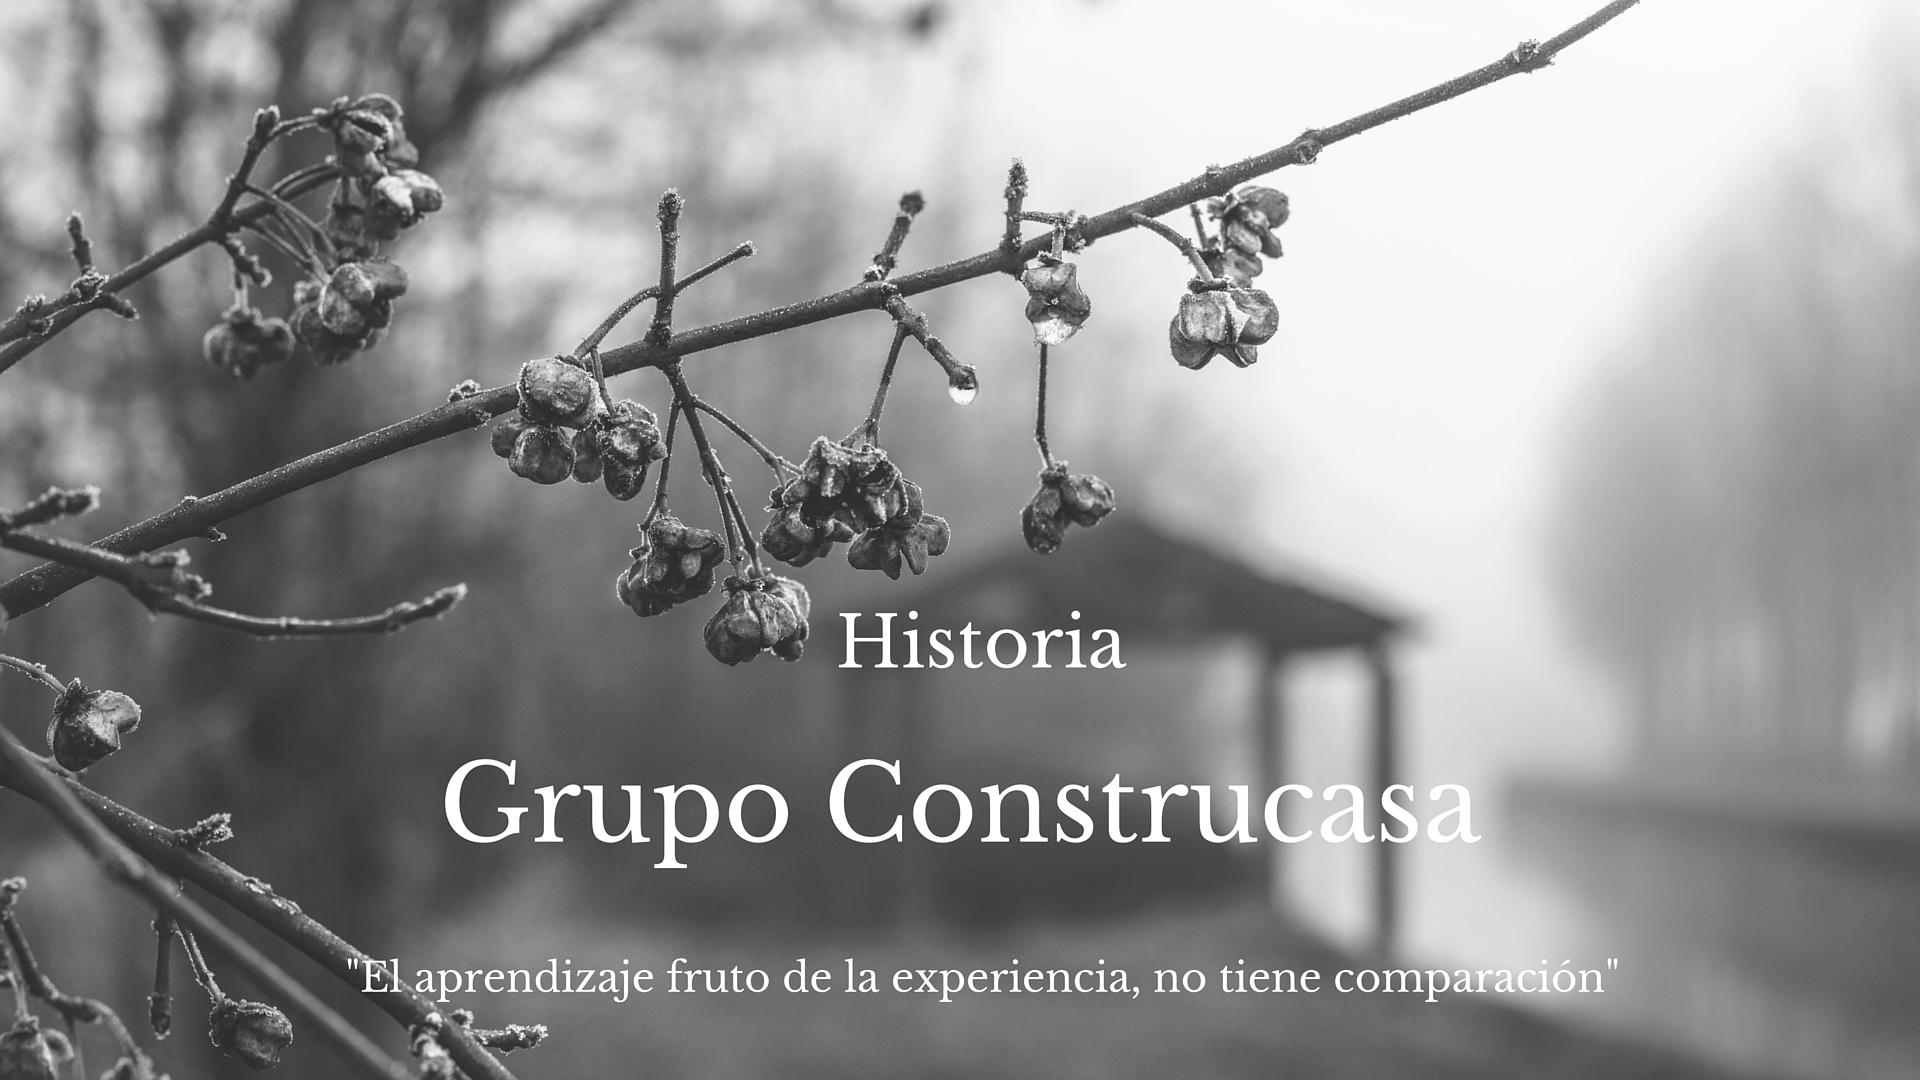 historia Grupo Construcasa